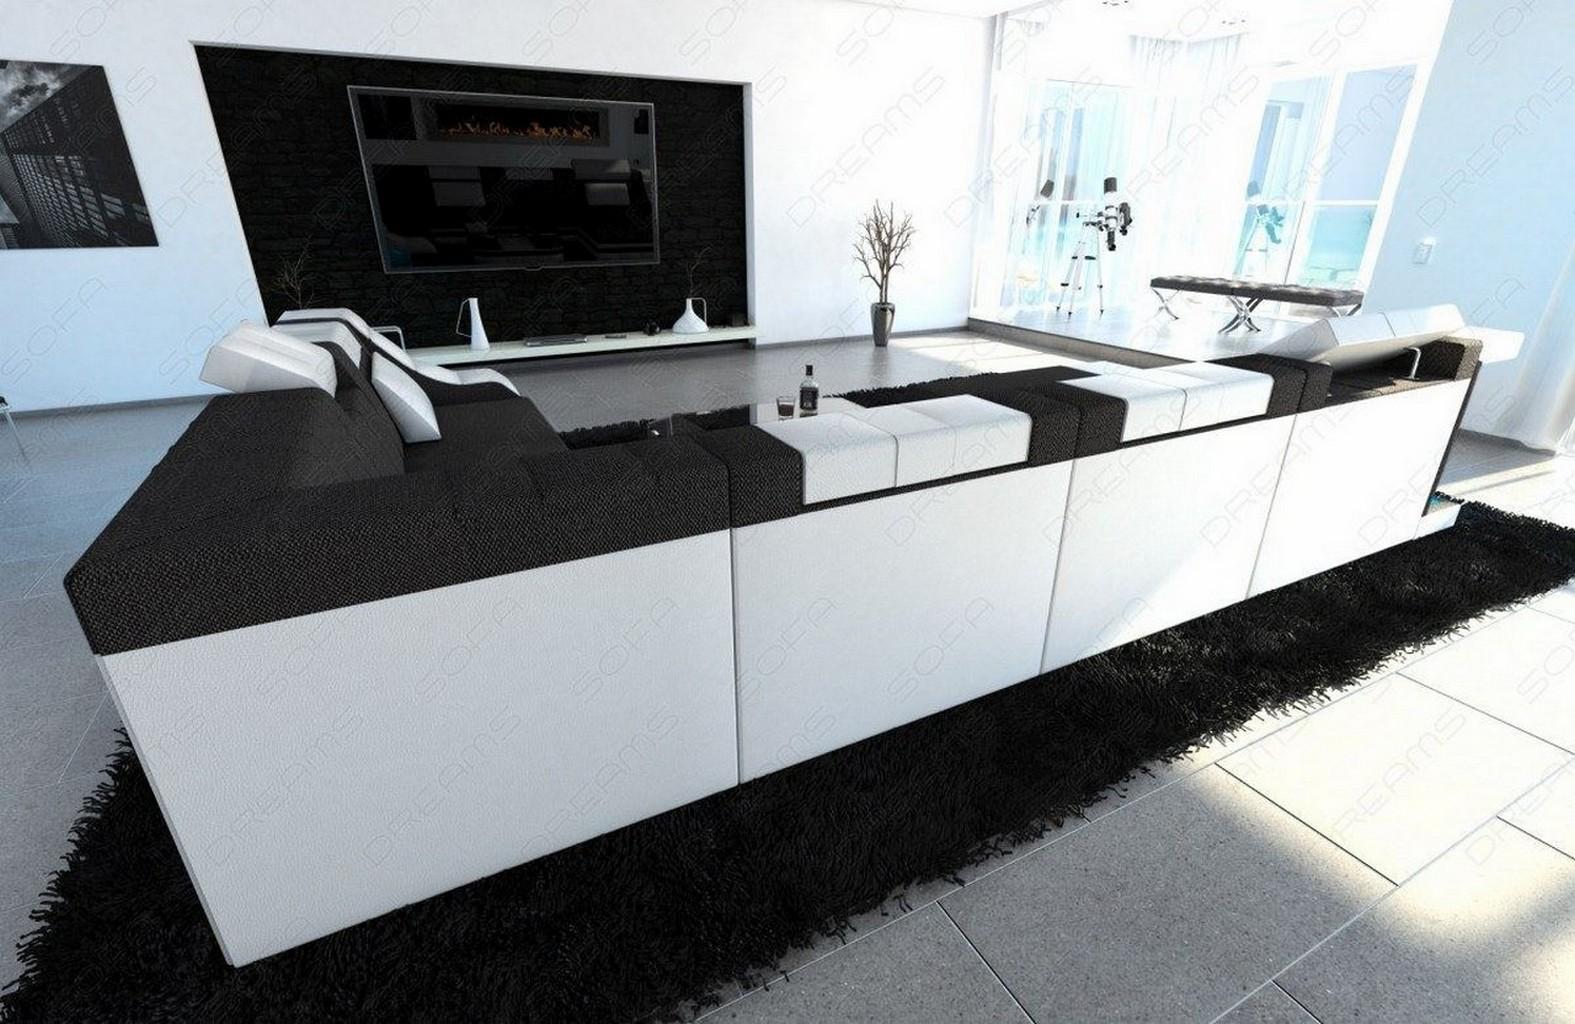 sofa wohnlandschaft polster turino xxl design stoff couch dunkelgrau beleuchtung ebay. Black Bedroom Furniture Sets. Home Design Ideas